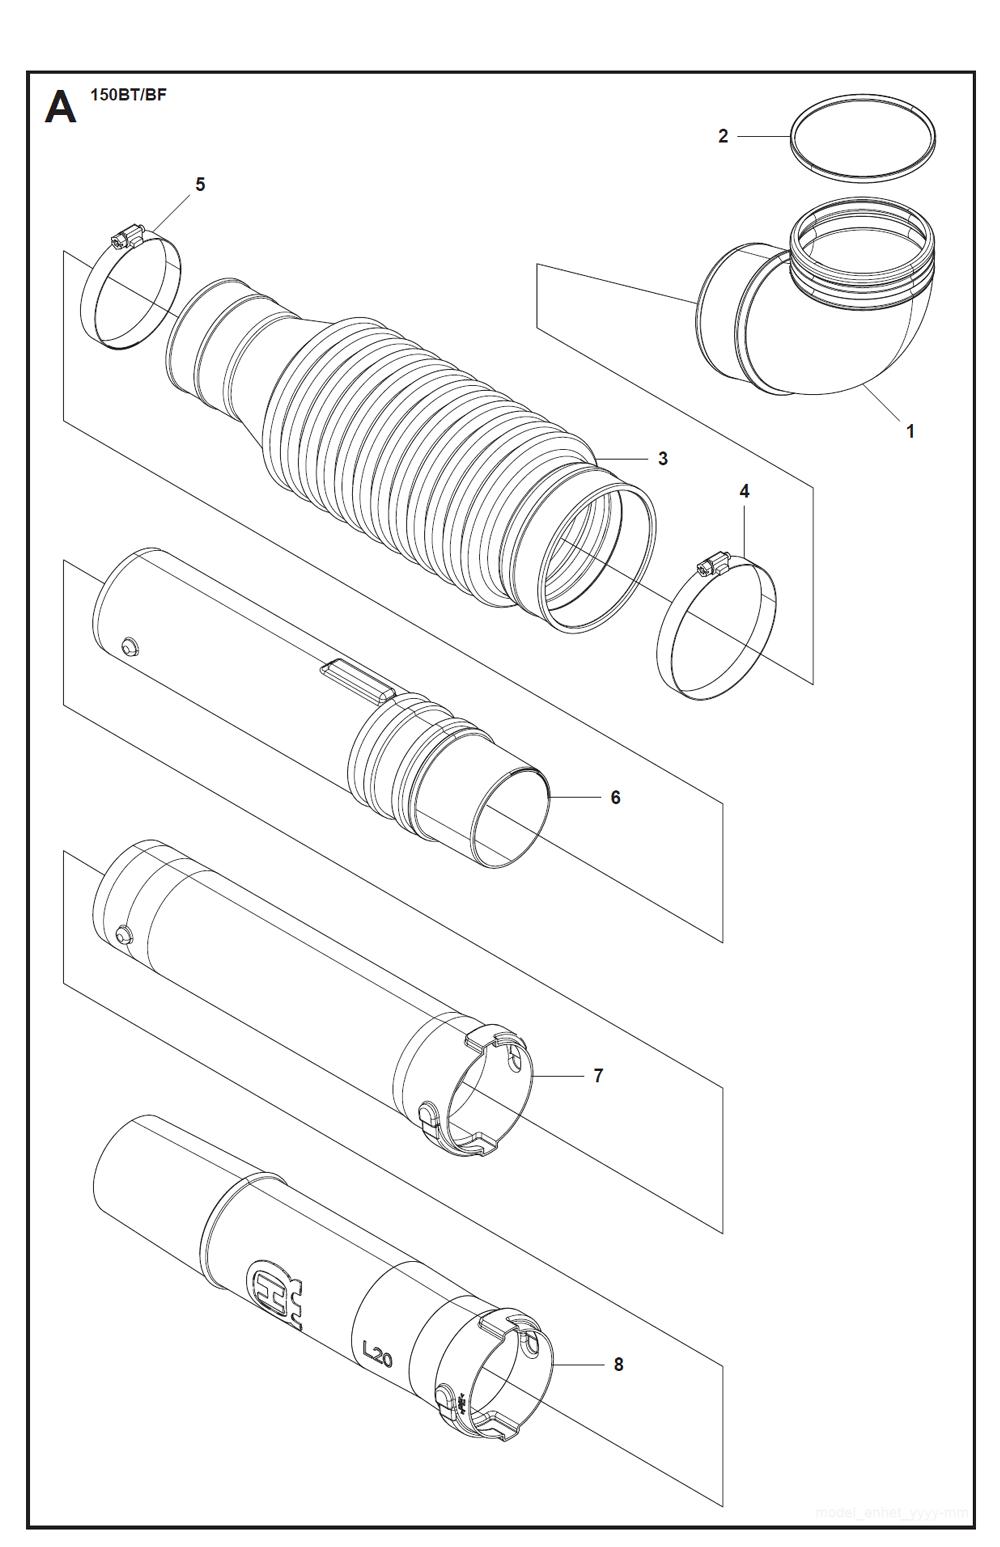 Buy Husqvarna 150BT (5228461-01) Replacement Tool Parts